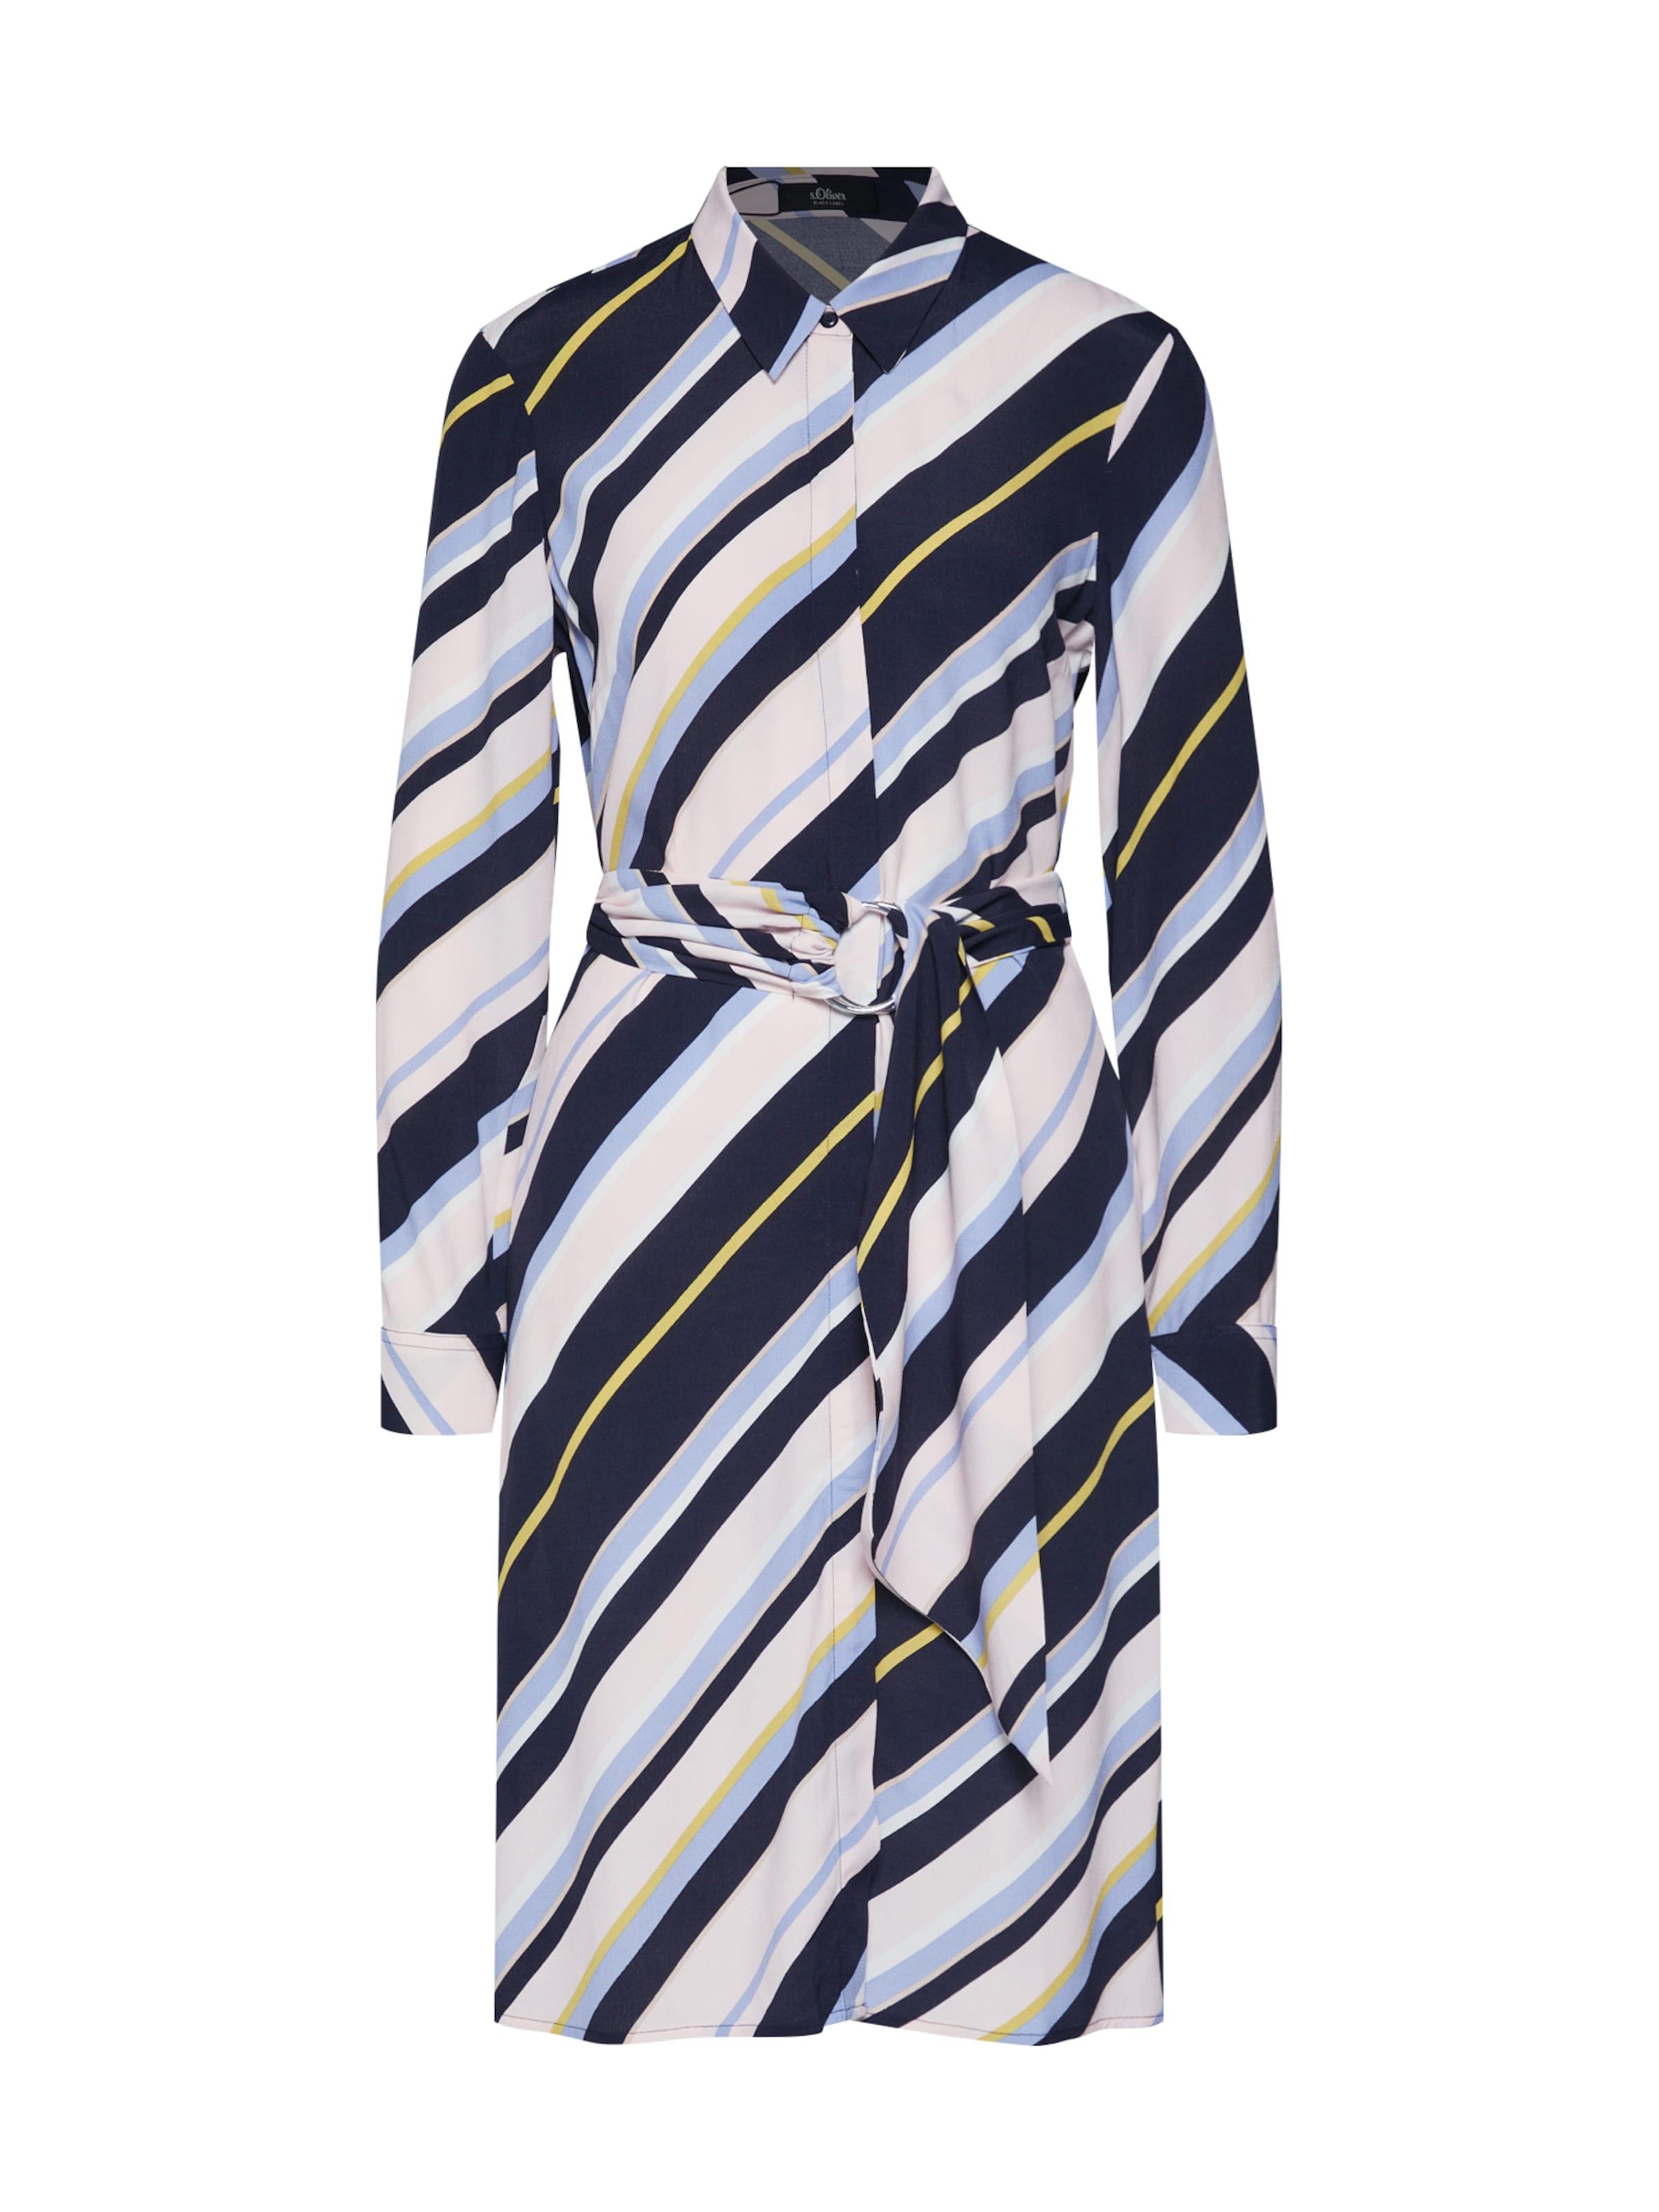 BleuMélange De Label oliver chemise En S Couleurs Black Robe JcFl3TK1